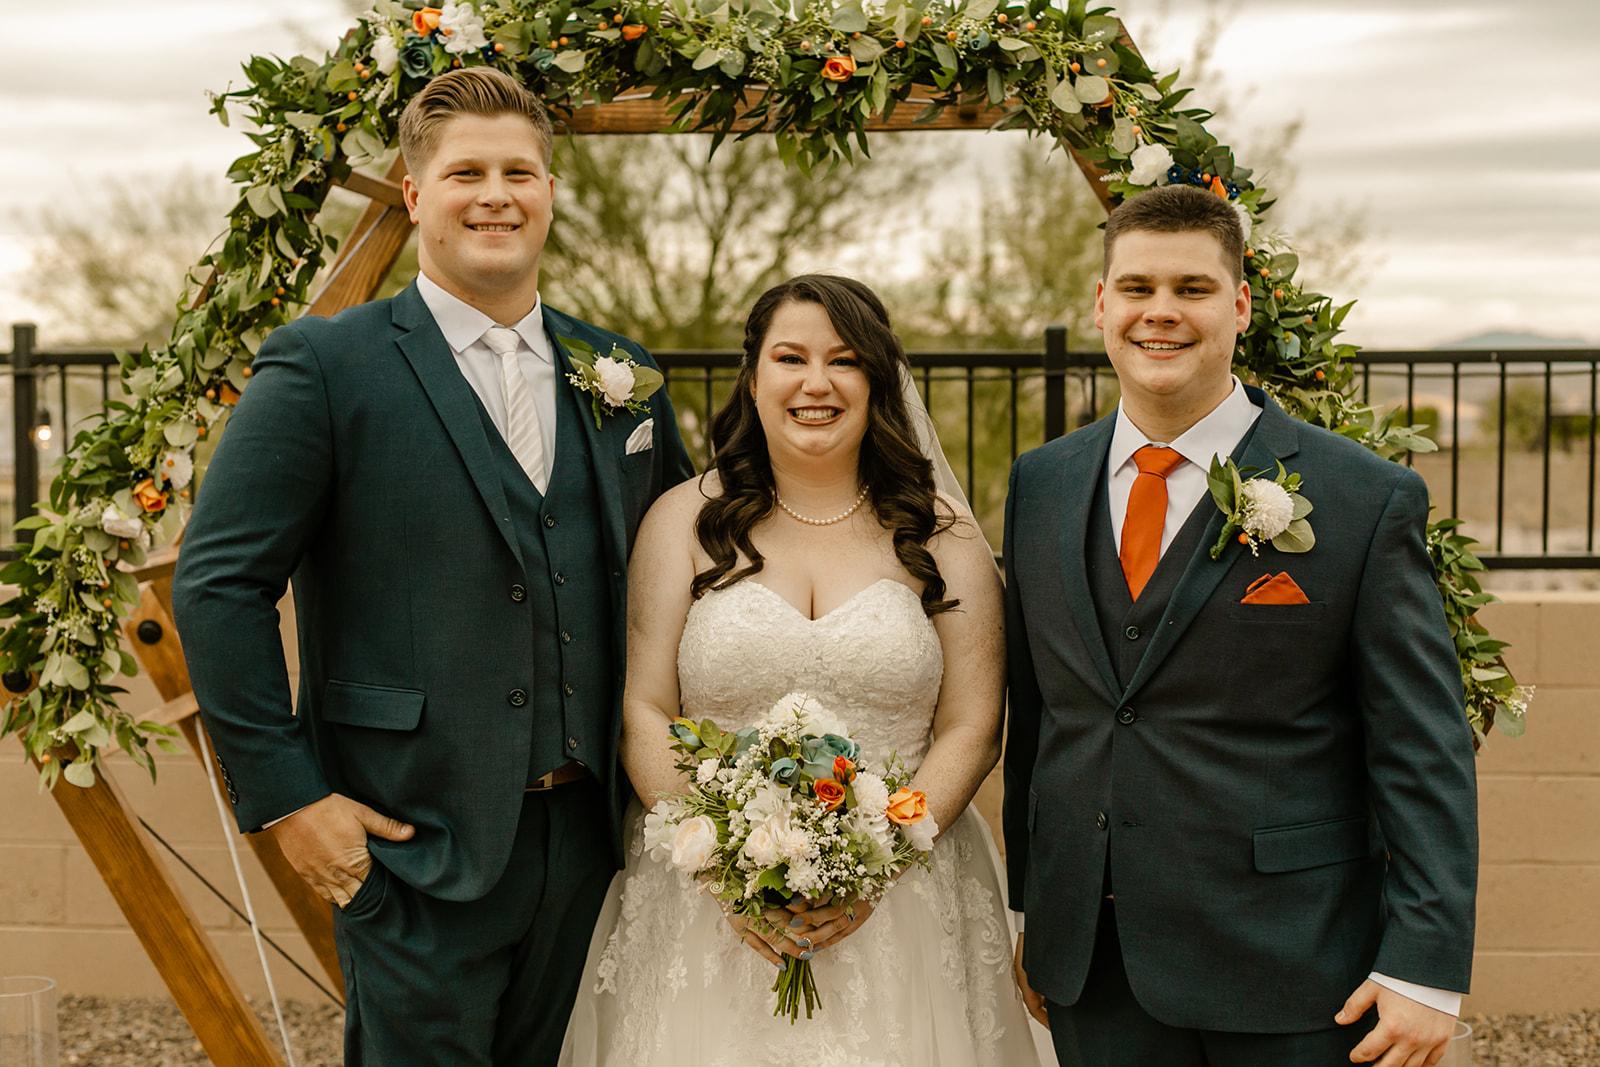 Stress Free Family Photos - Washington Wedding Photographer